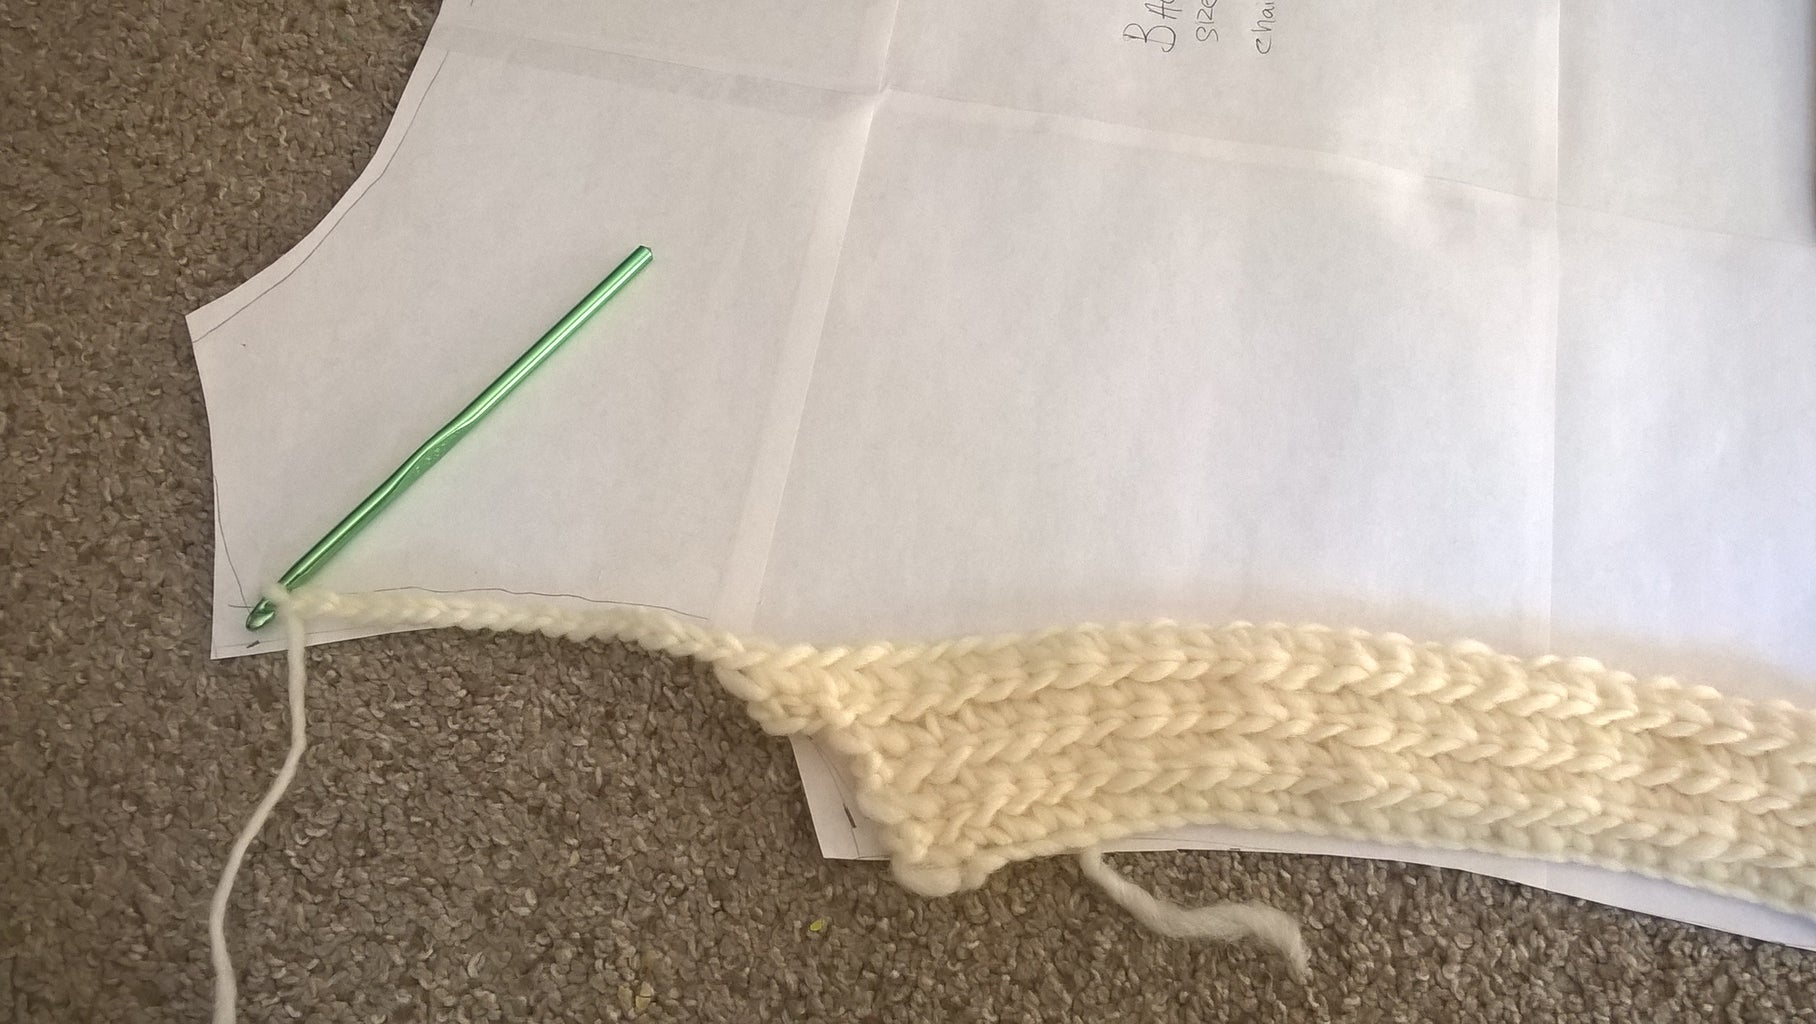 Crocheting the Back Panel